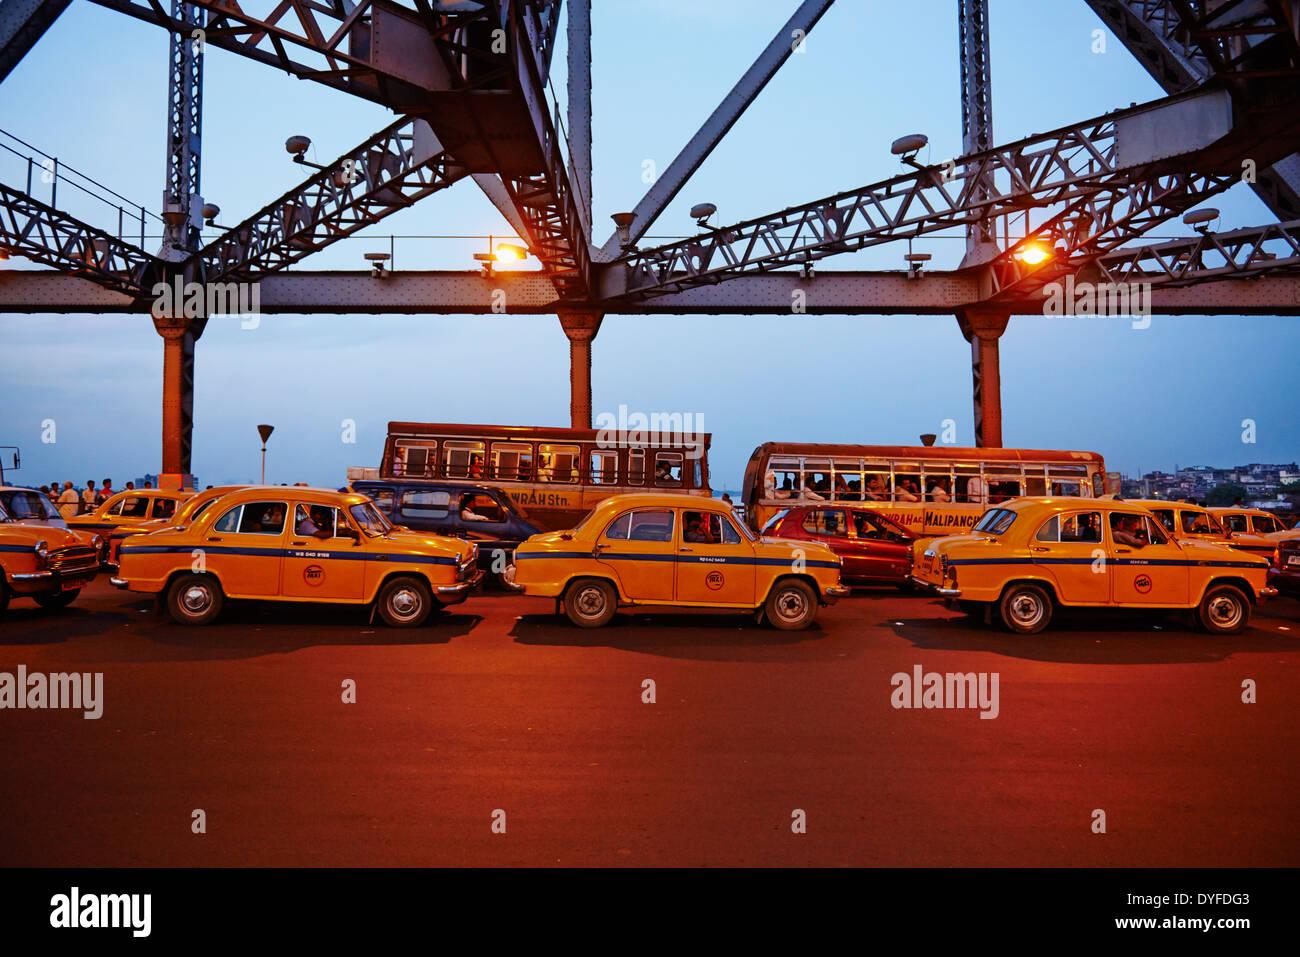 India, West Bengal, Kolkata, Calcutta, Howrah bridge - Stock Image